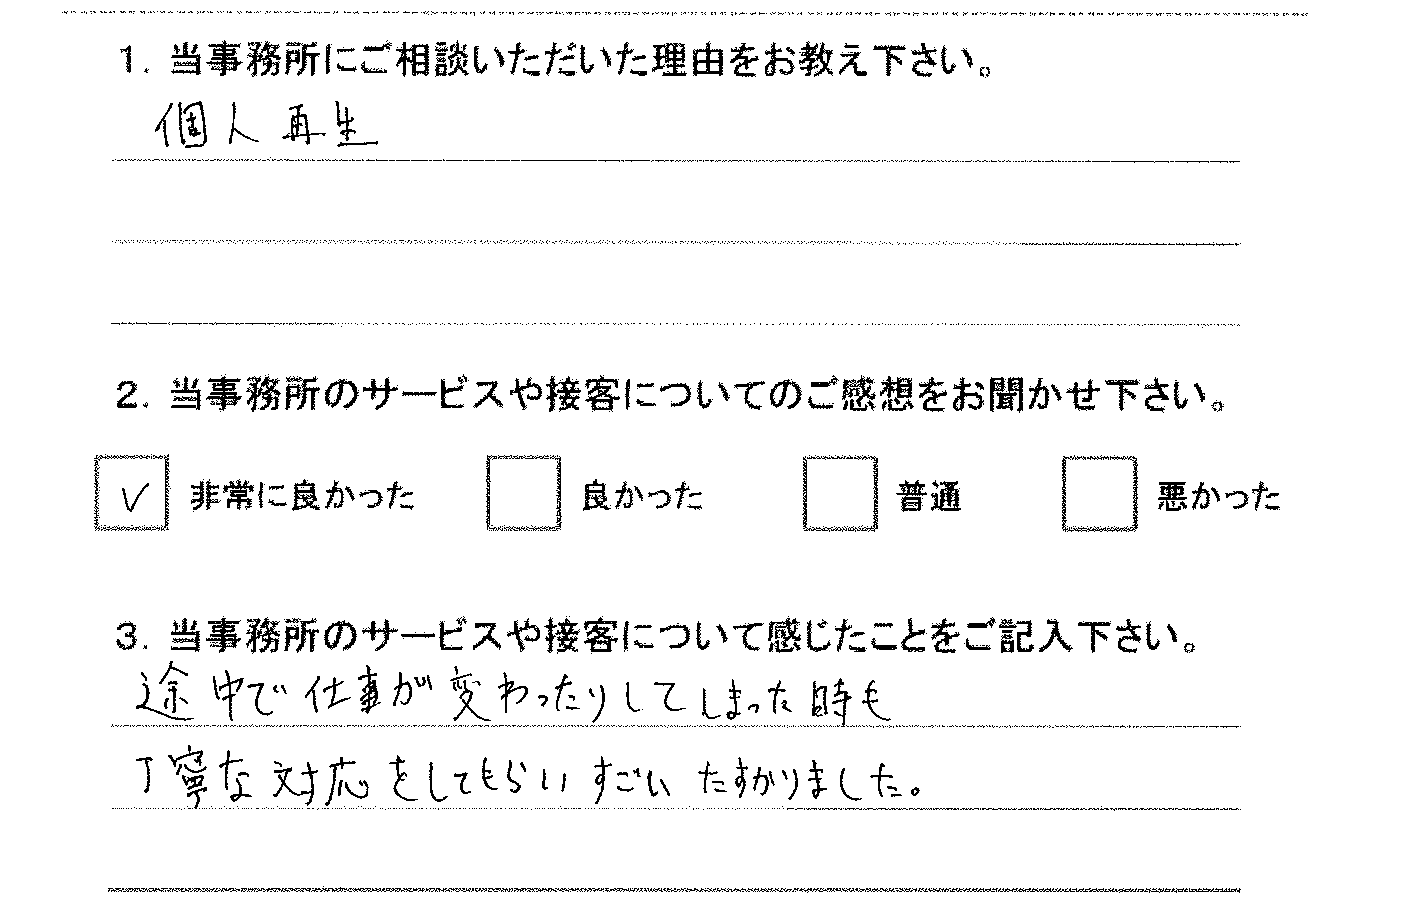 201507_03